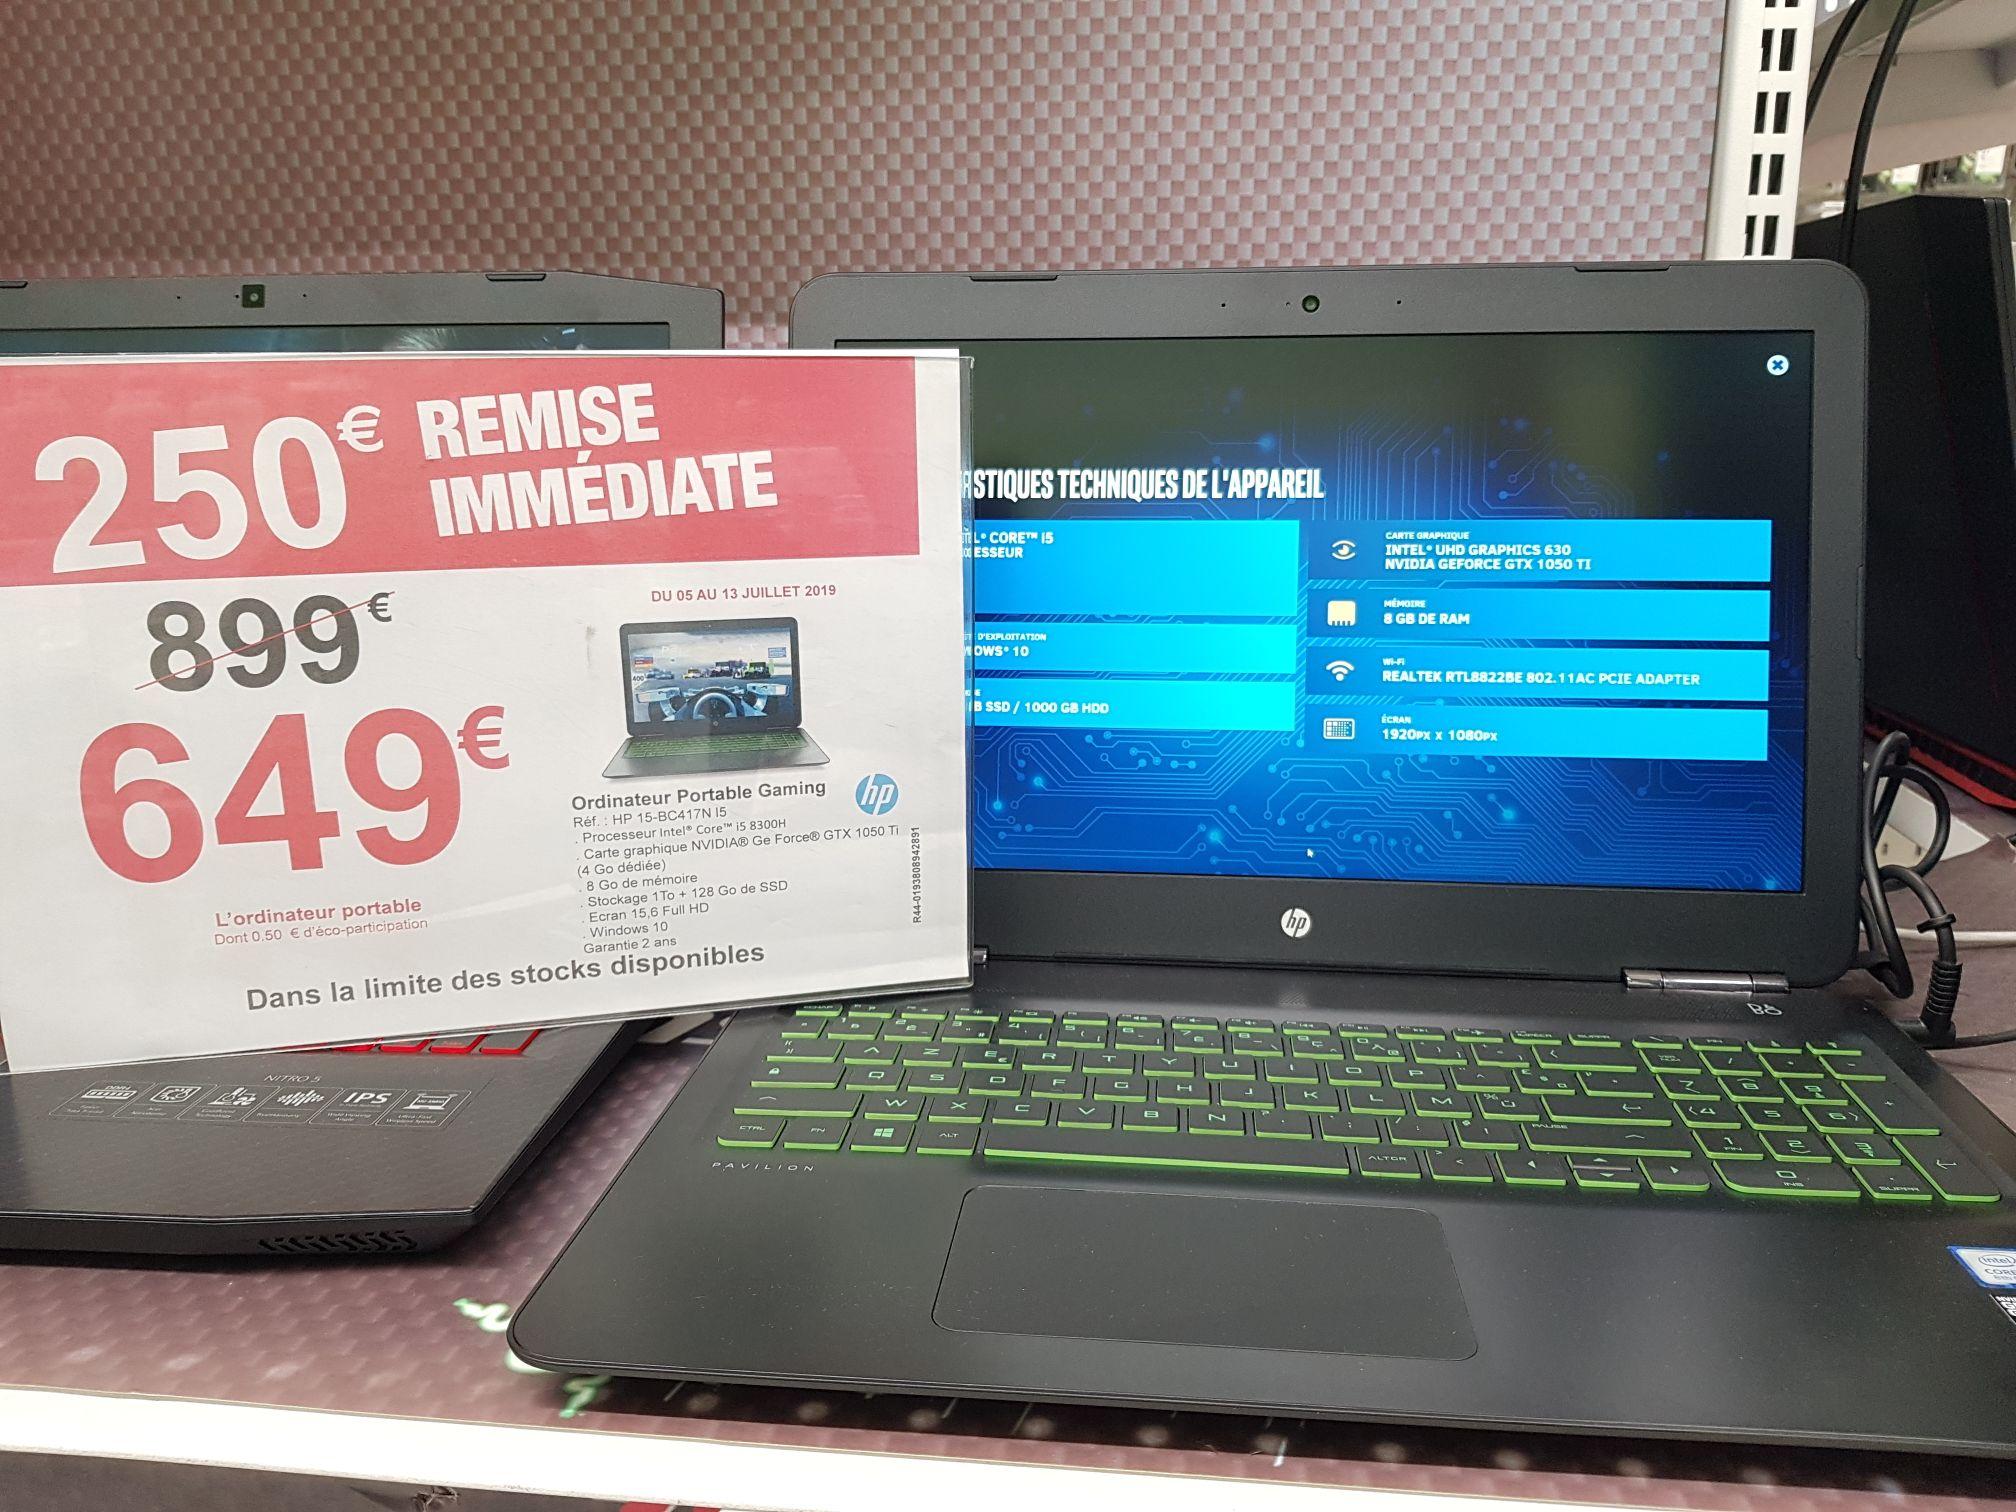 "PC Portable 15.6"" HP Pavilion 15-bc417nf  - Full HD, I5-8300H, RAM 8Go, 1To + SSD 128Go, GTX 1050 Ti 4Go, Windows 10 - National"